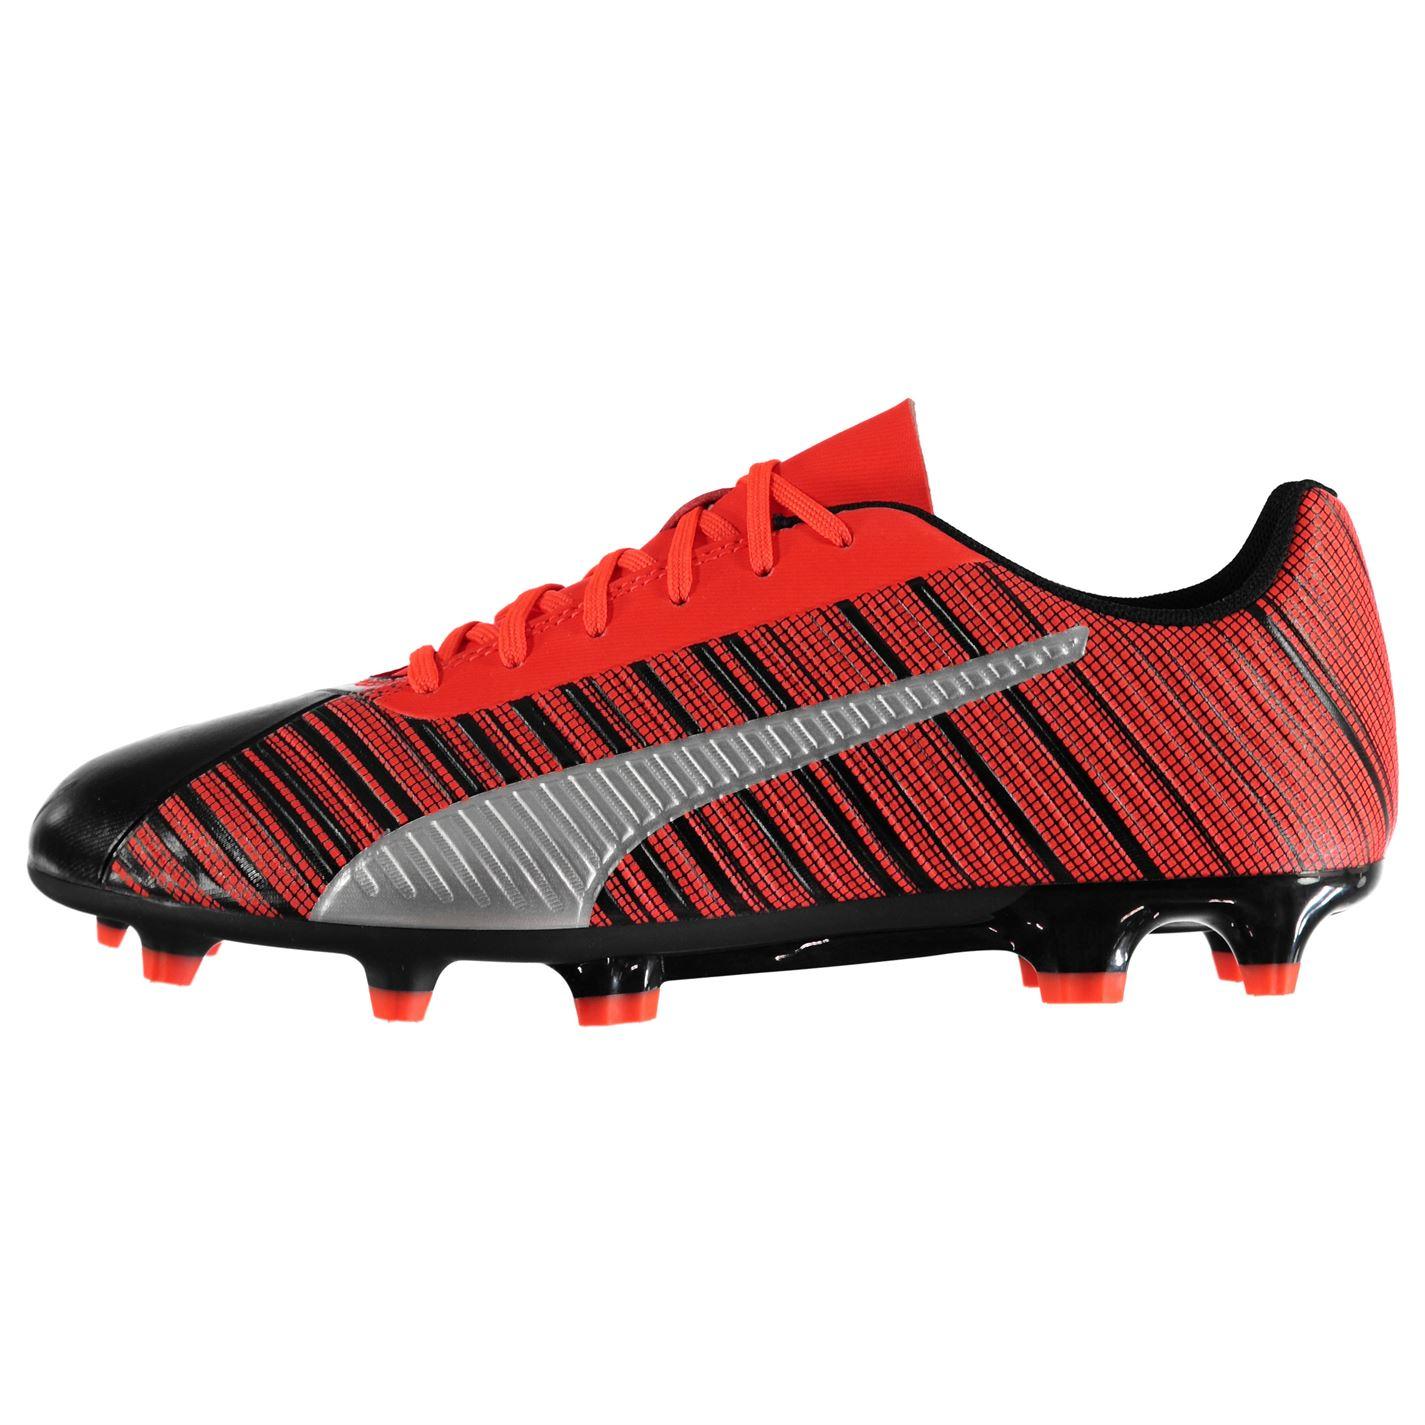 Puma One 5.4 Mens FG Football Boots